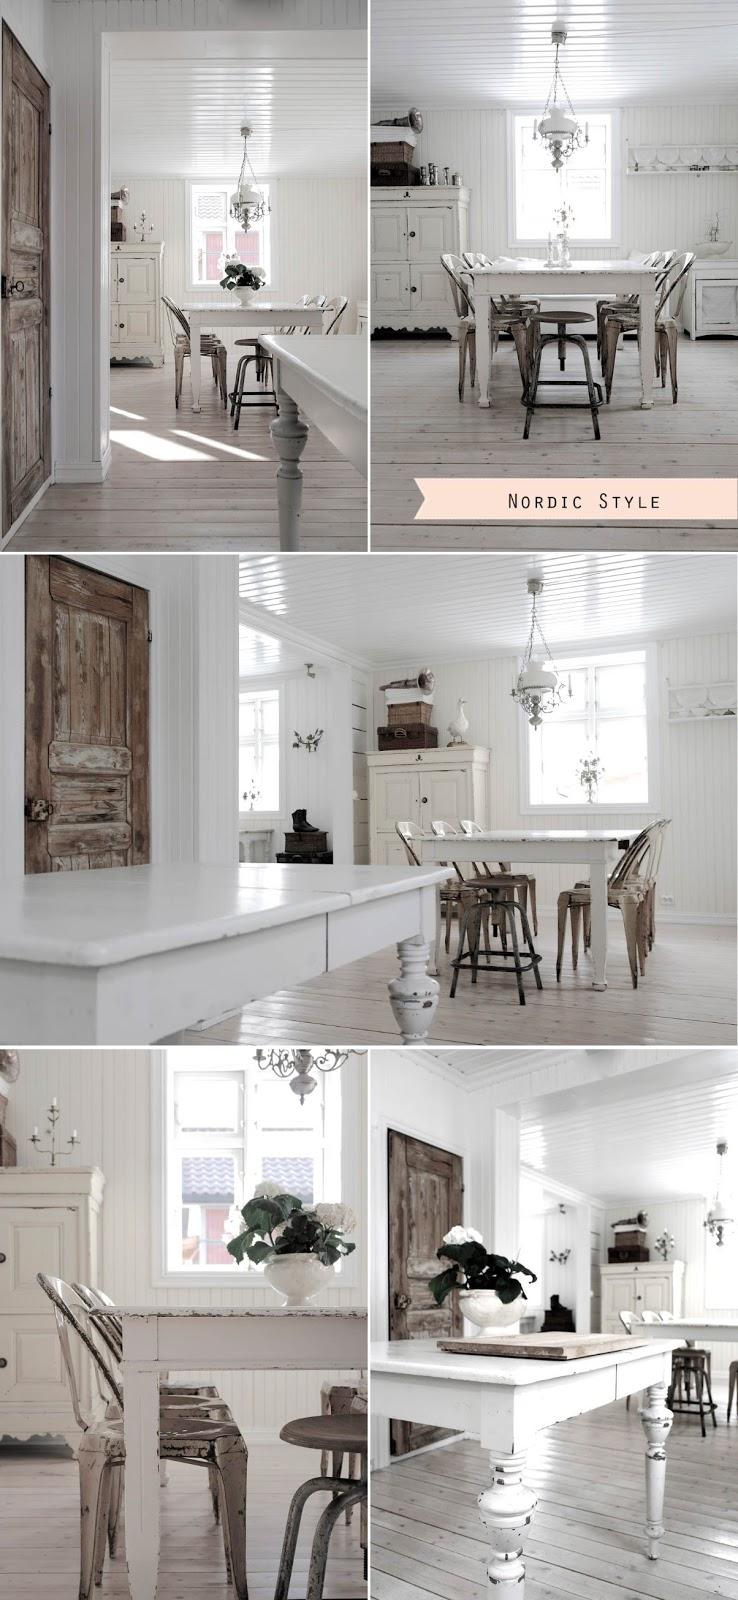 Stile nordico vs stile industriale shabby chic interiors for Case arredate stile shabby